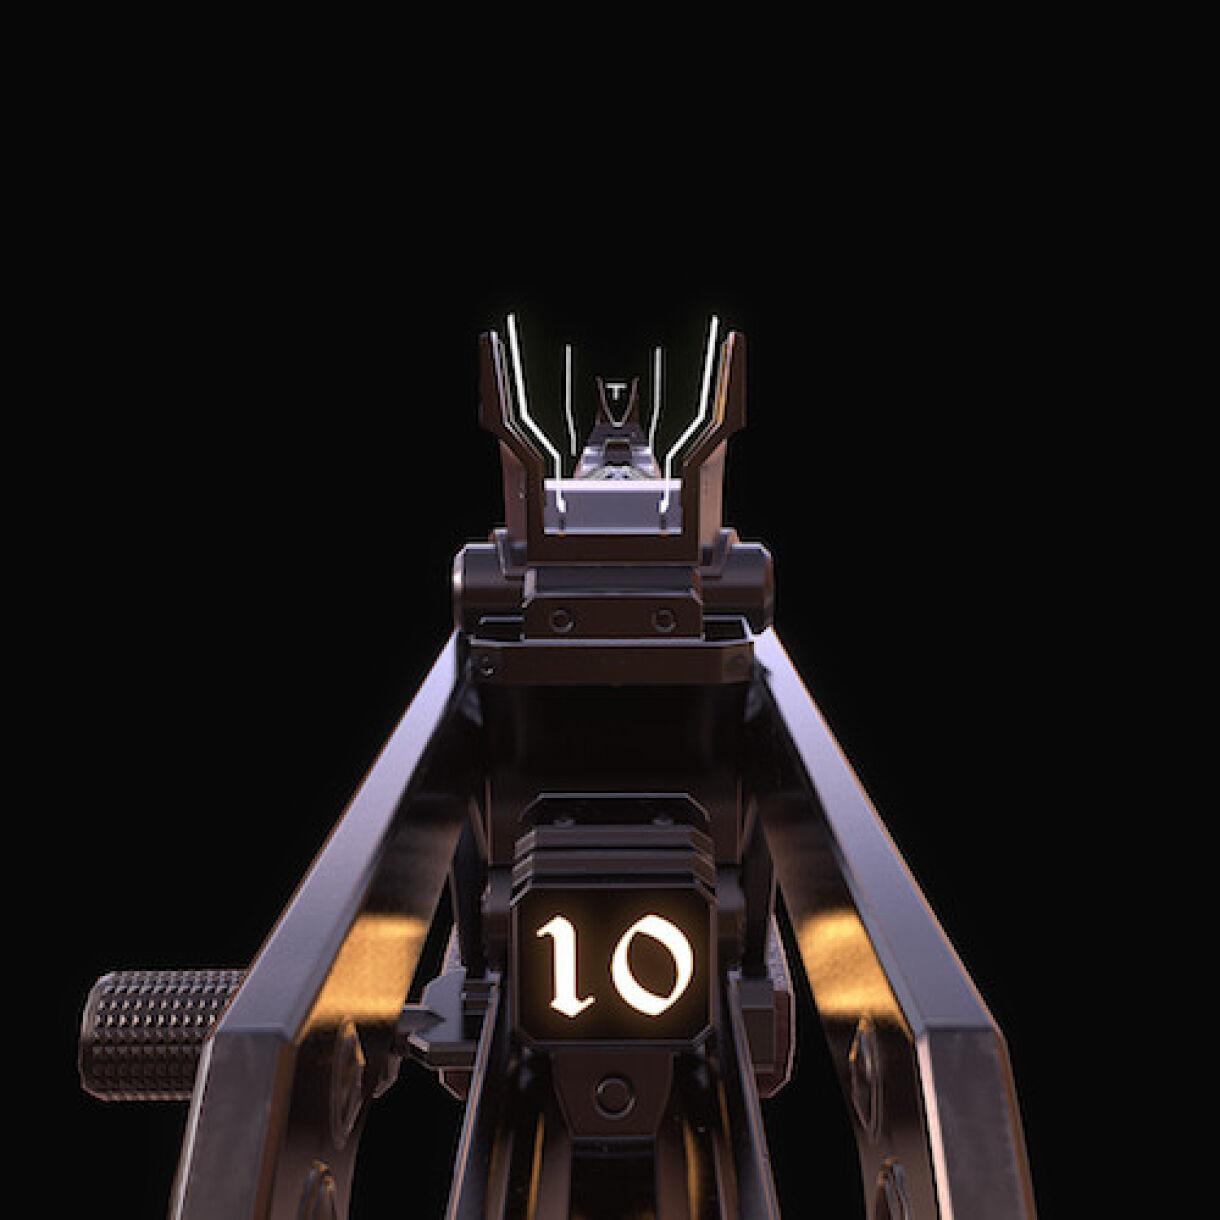 John Mesplay: Texturing a Gun From Destiny